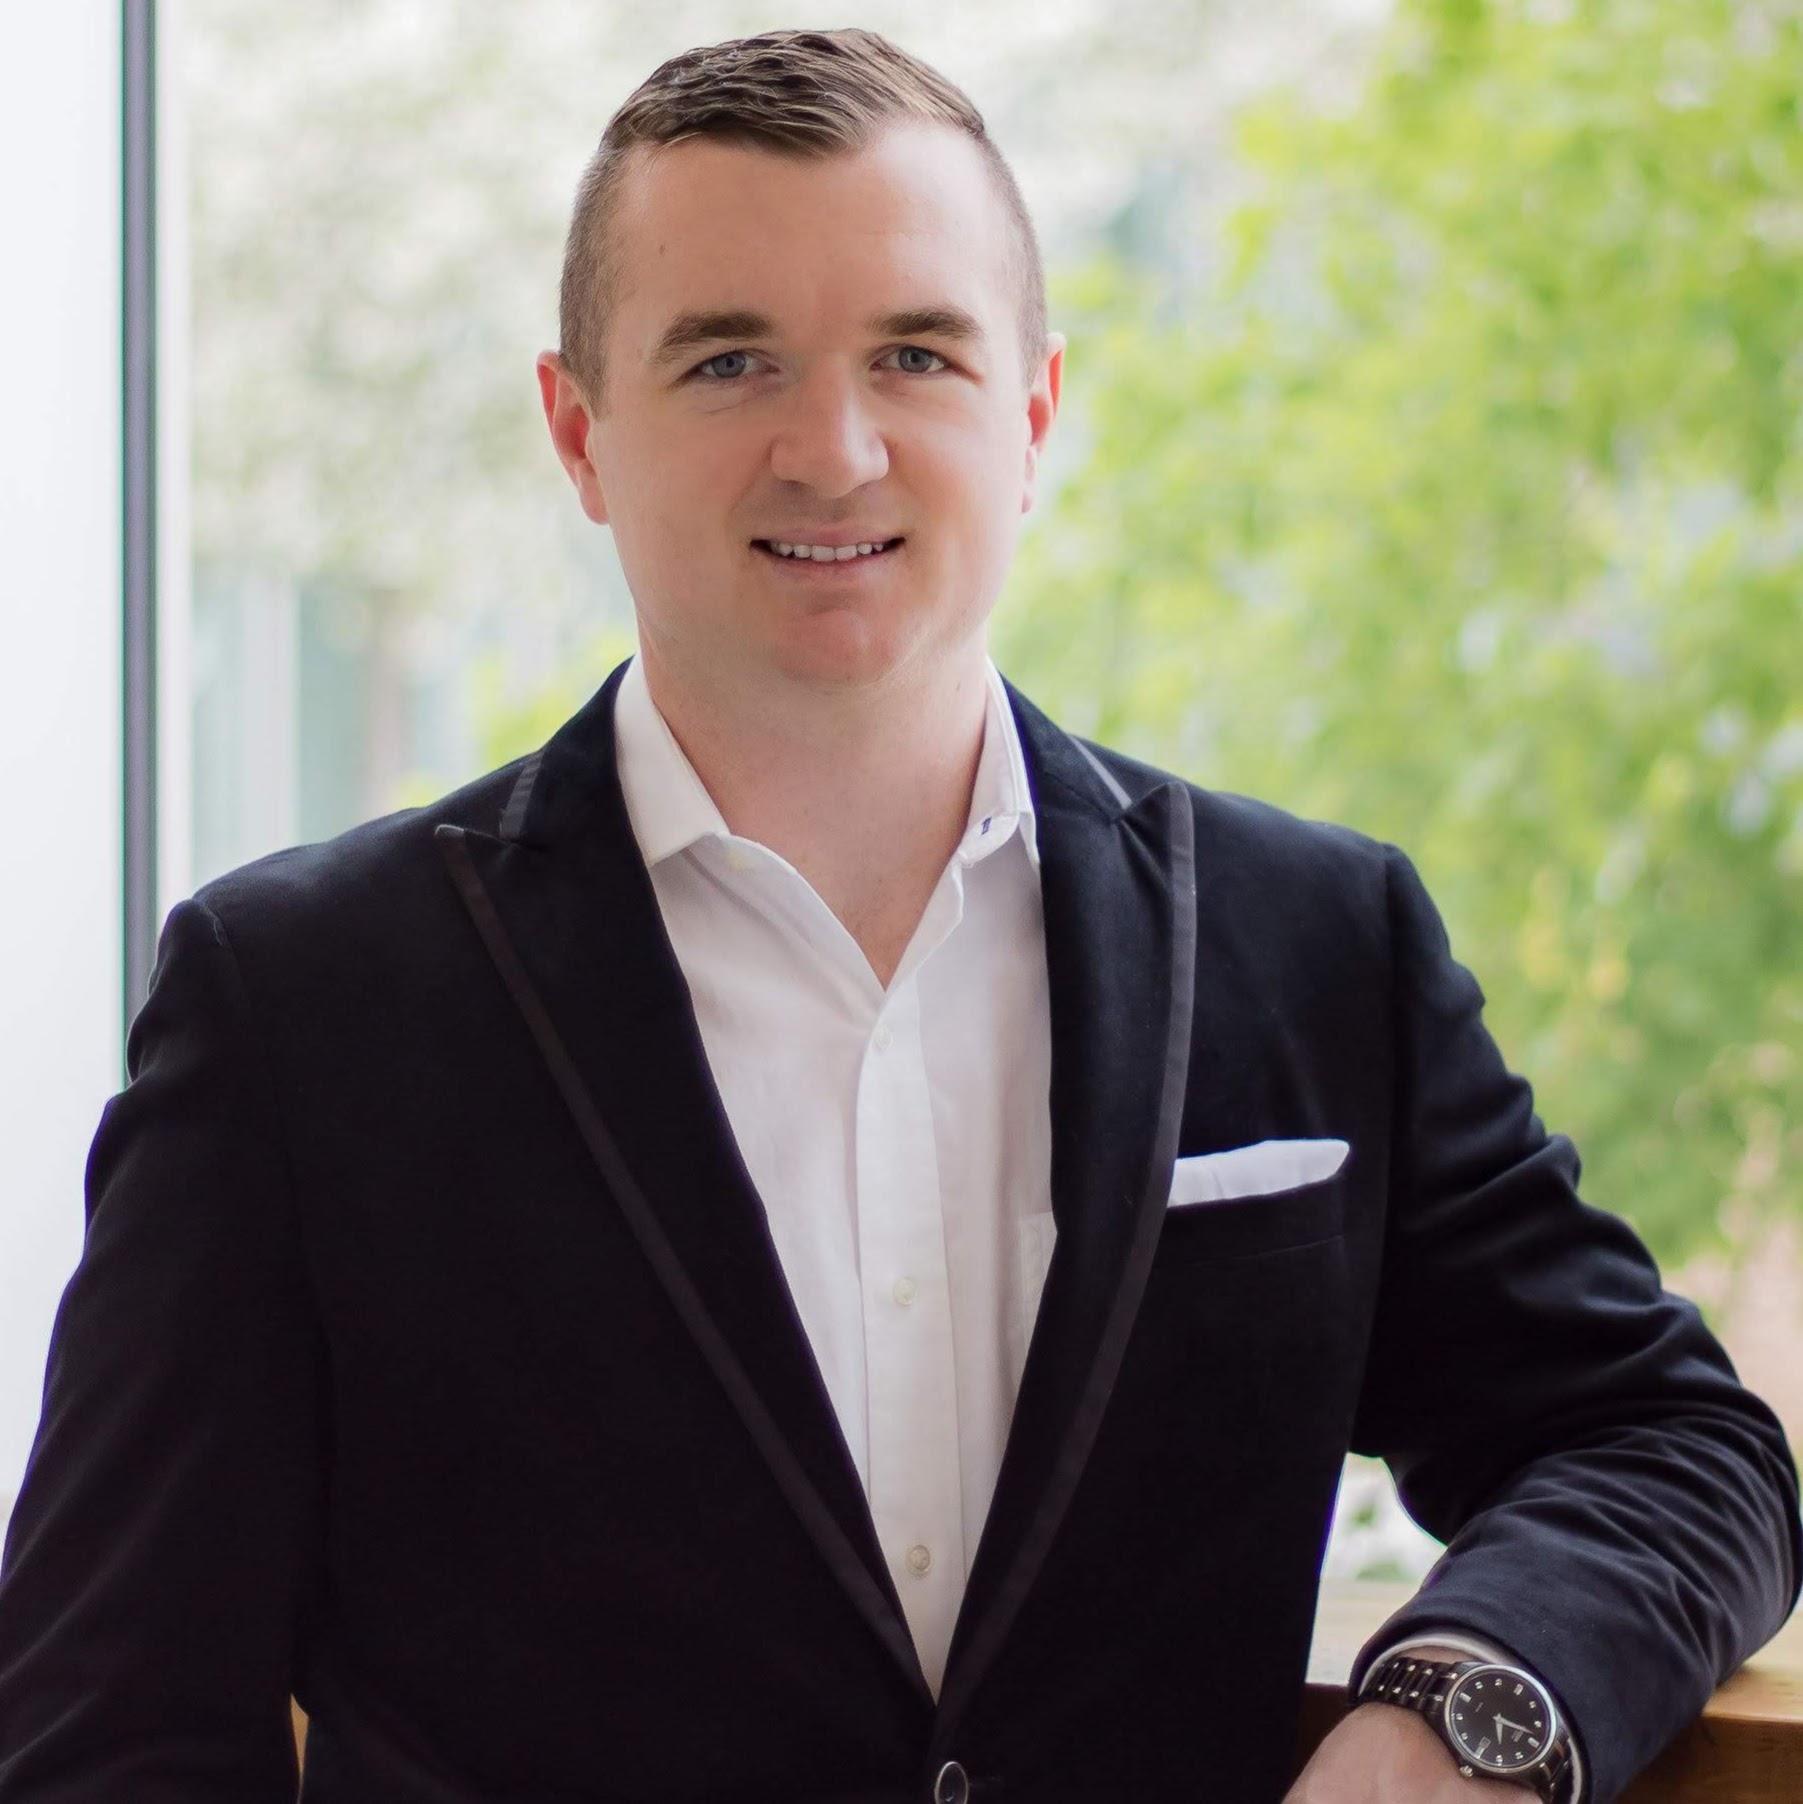 Brandon Haskins Mortgage Agent - Invis Inc